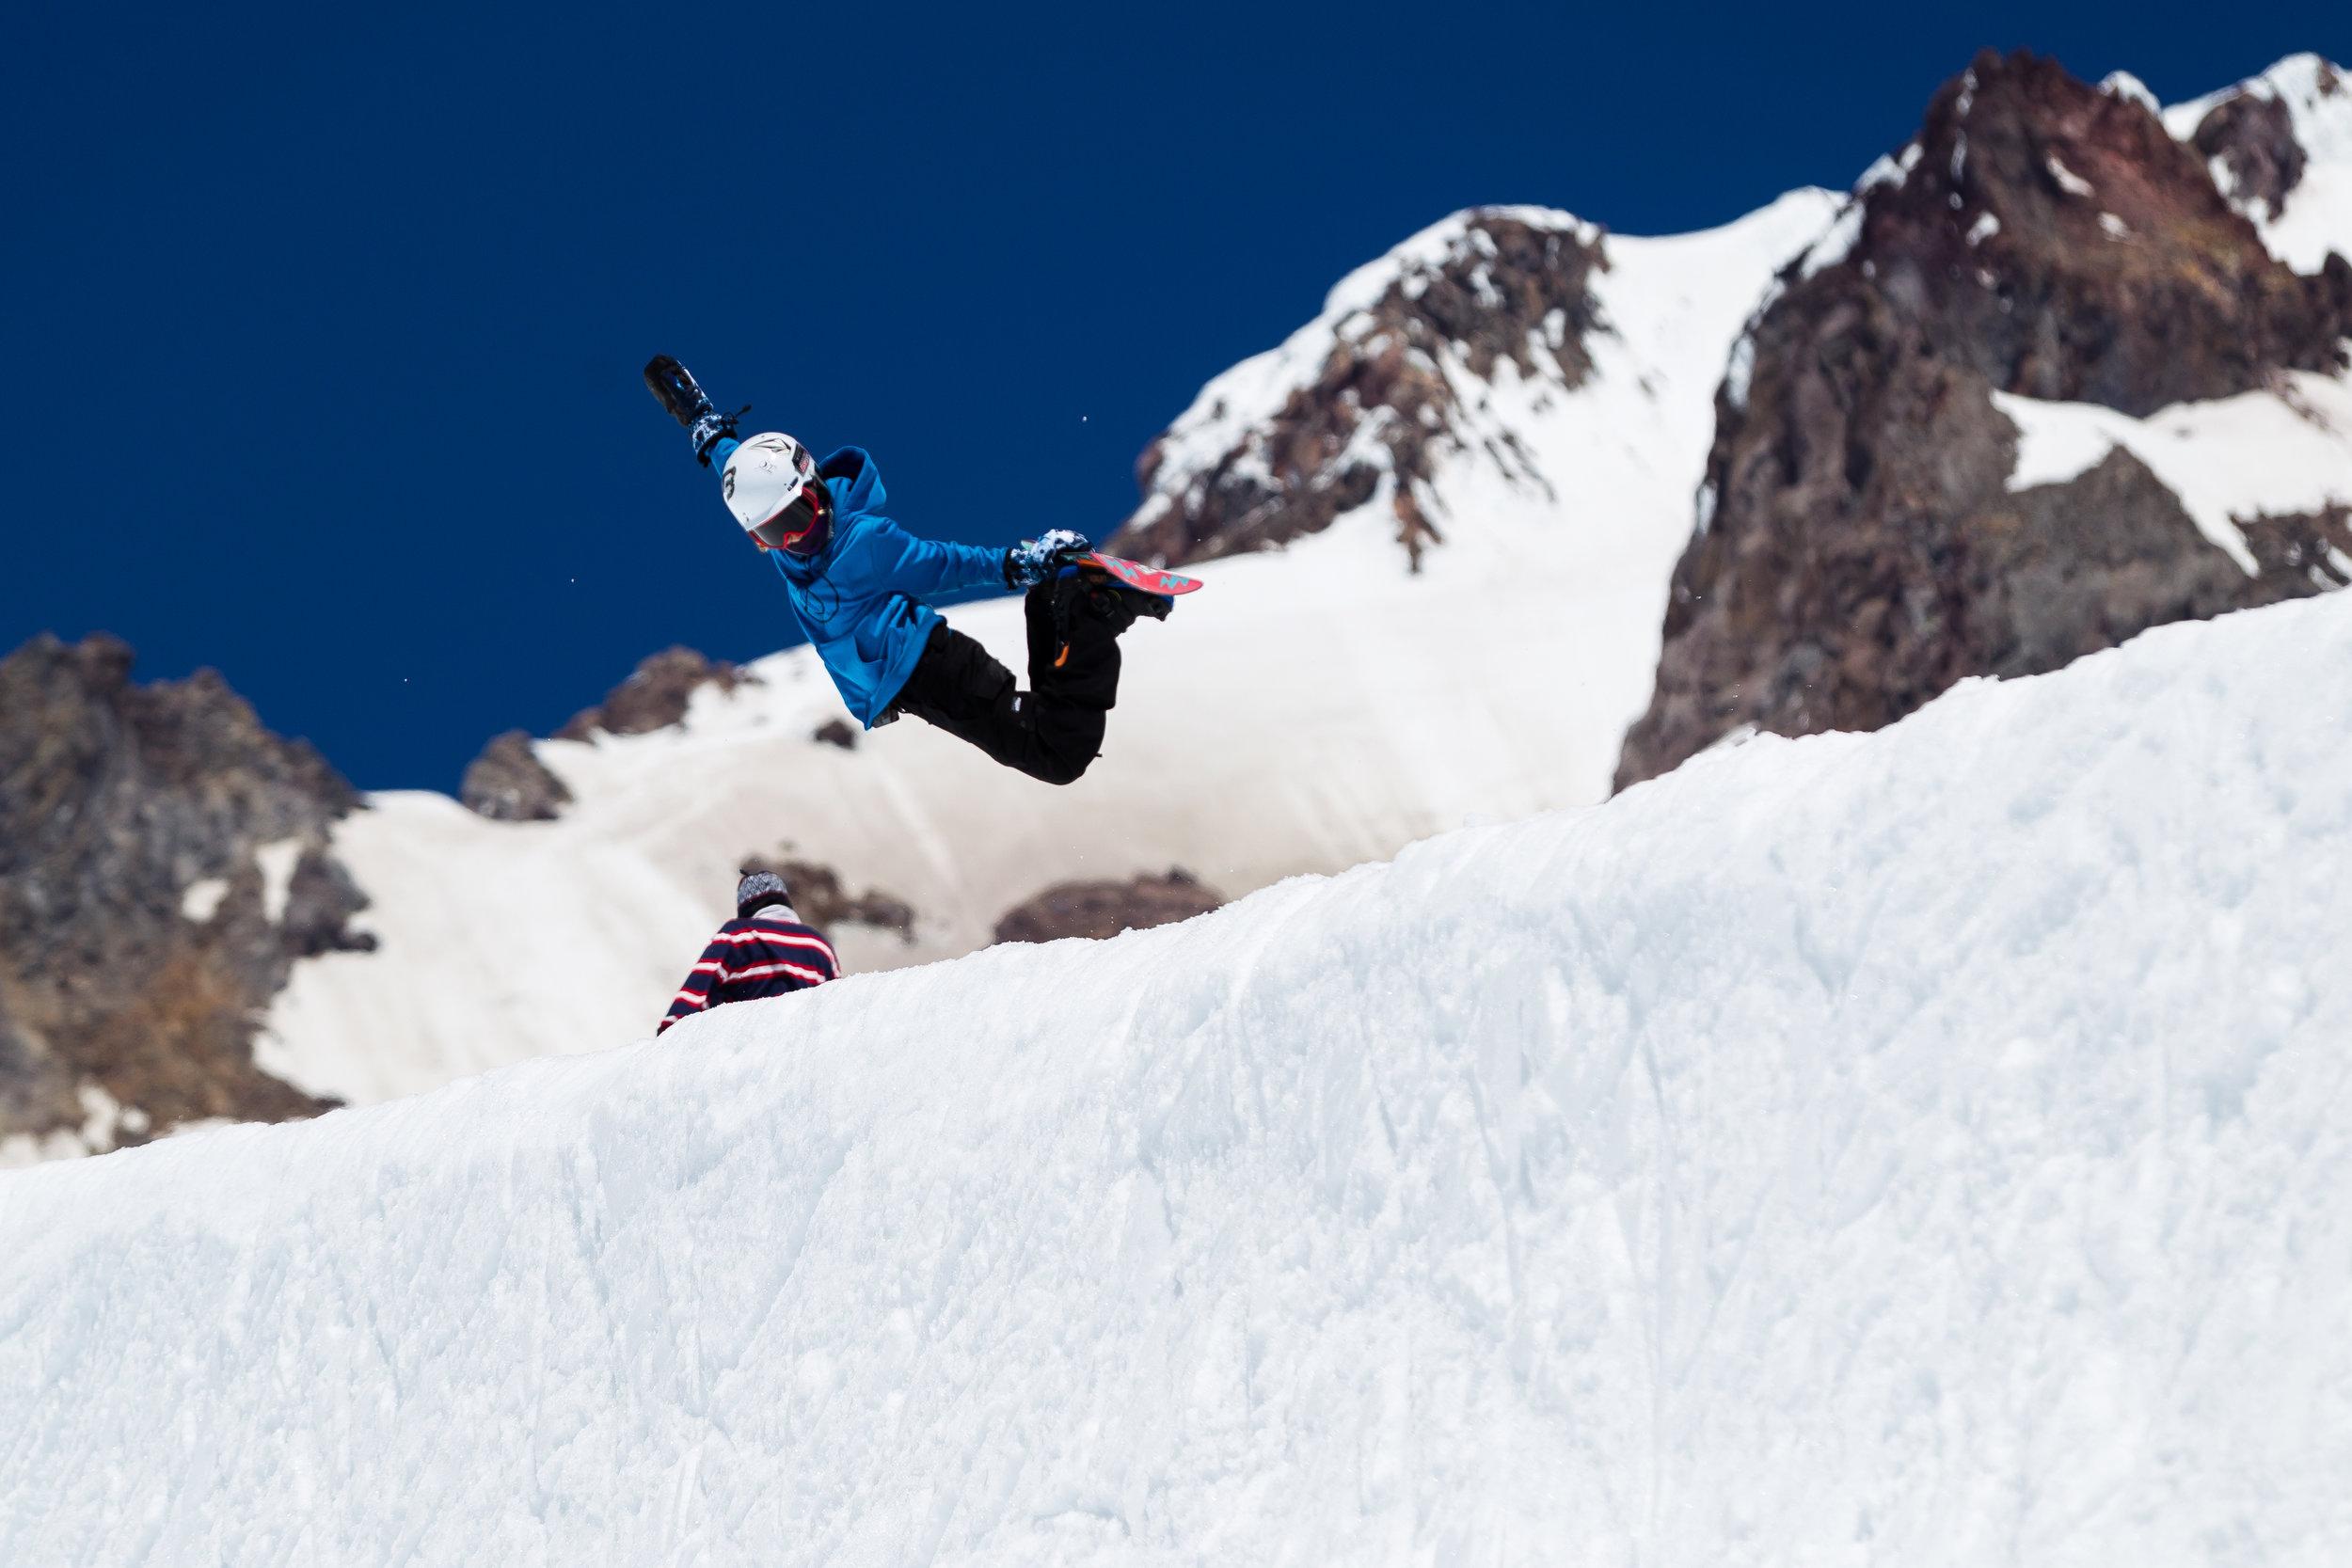 Snowboarding_CampersOnHill_TylerBenton-1.jpg